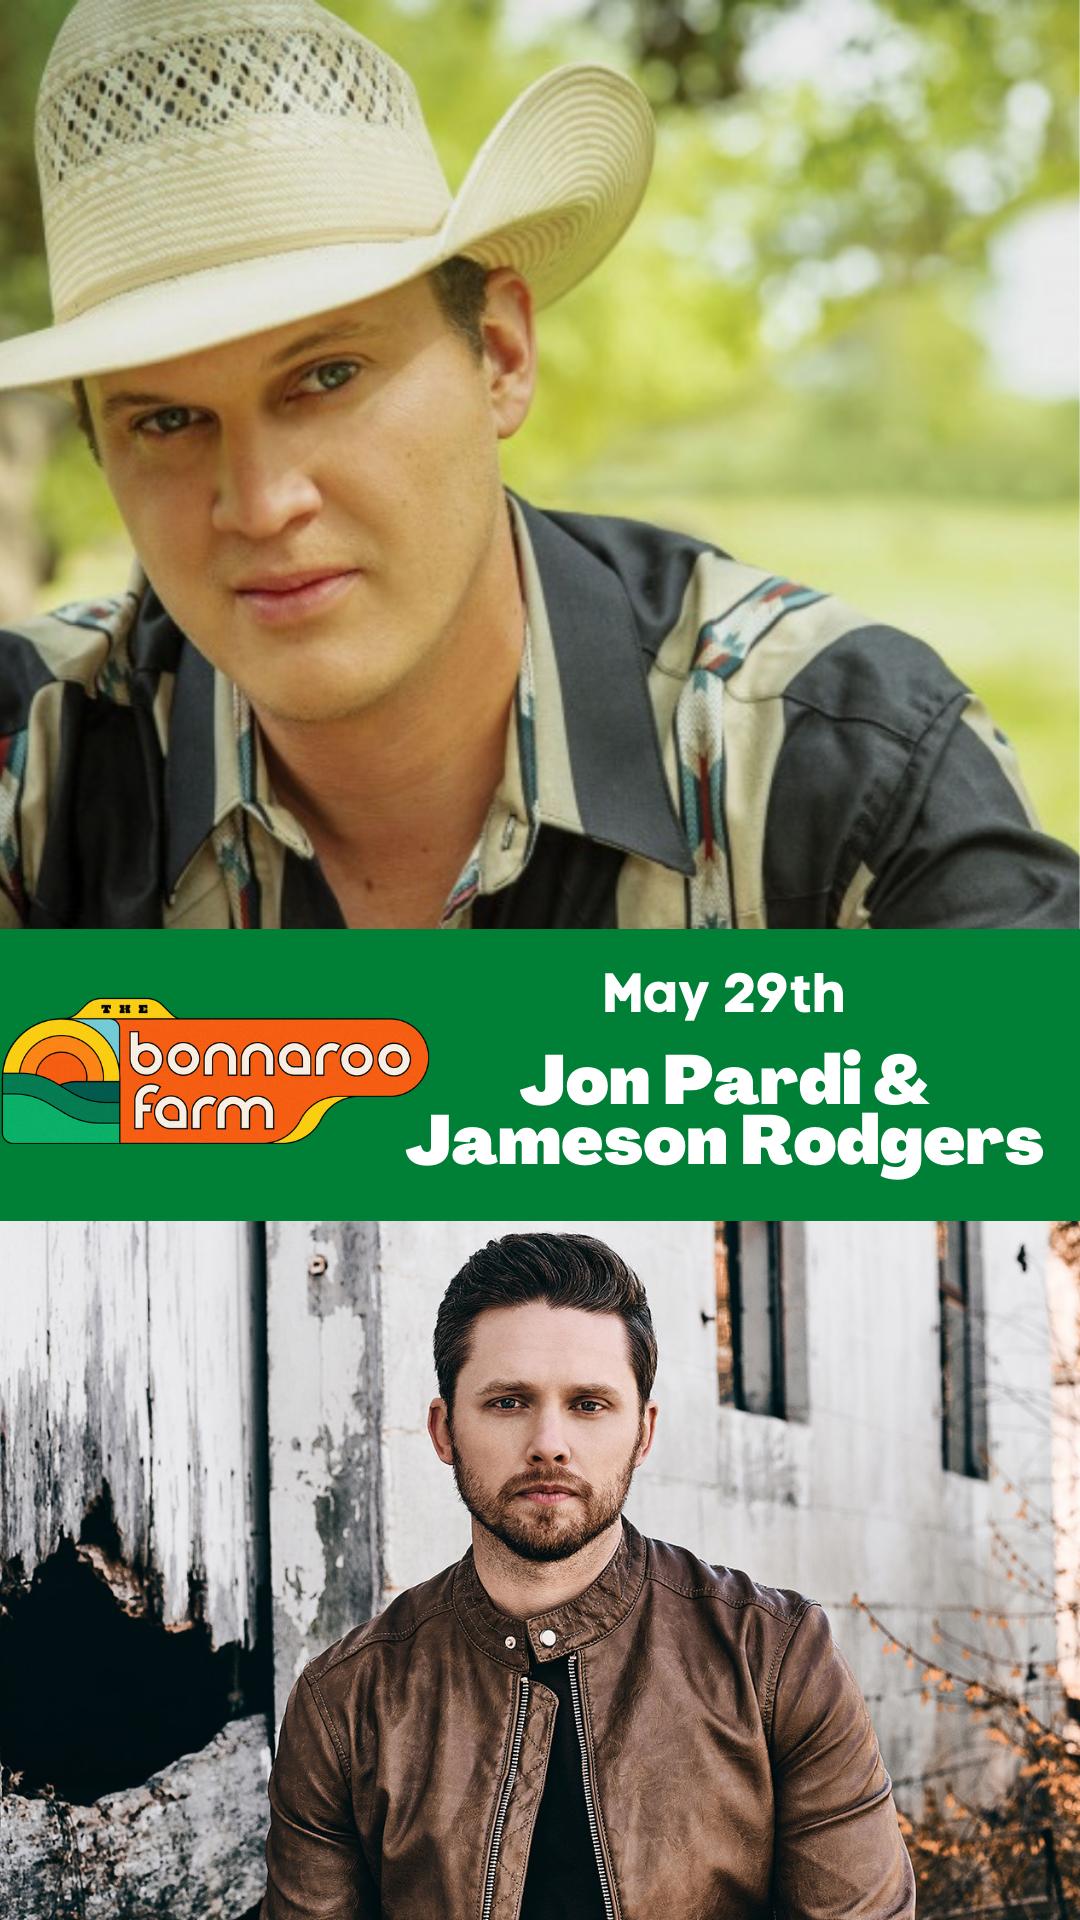 May 29th, Jon Pardi/Jameson Rodgers From Bonnaroo Farm